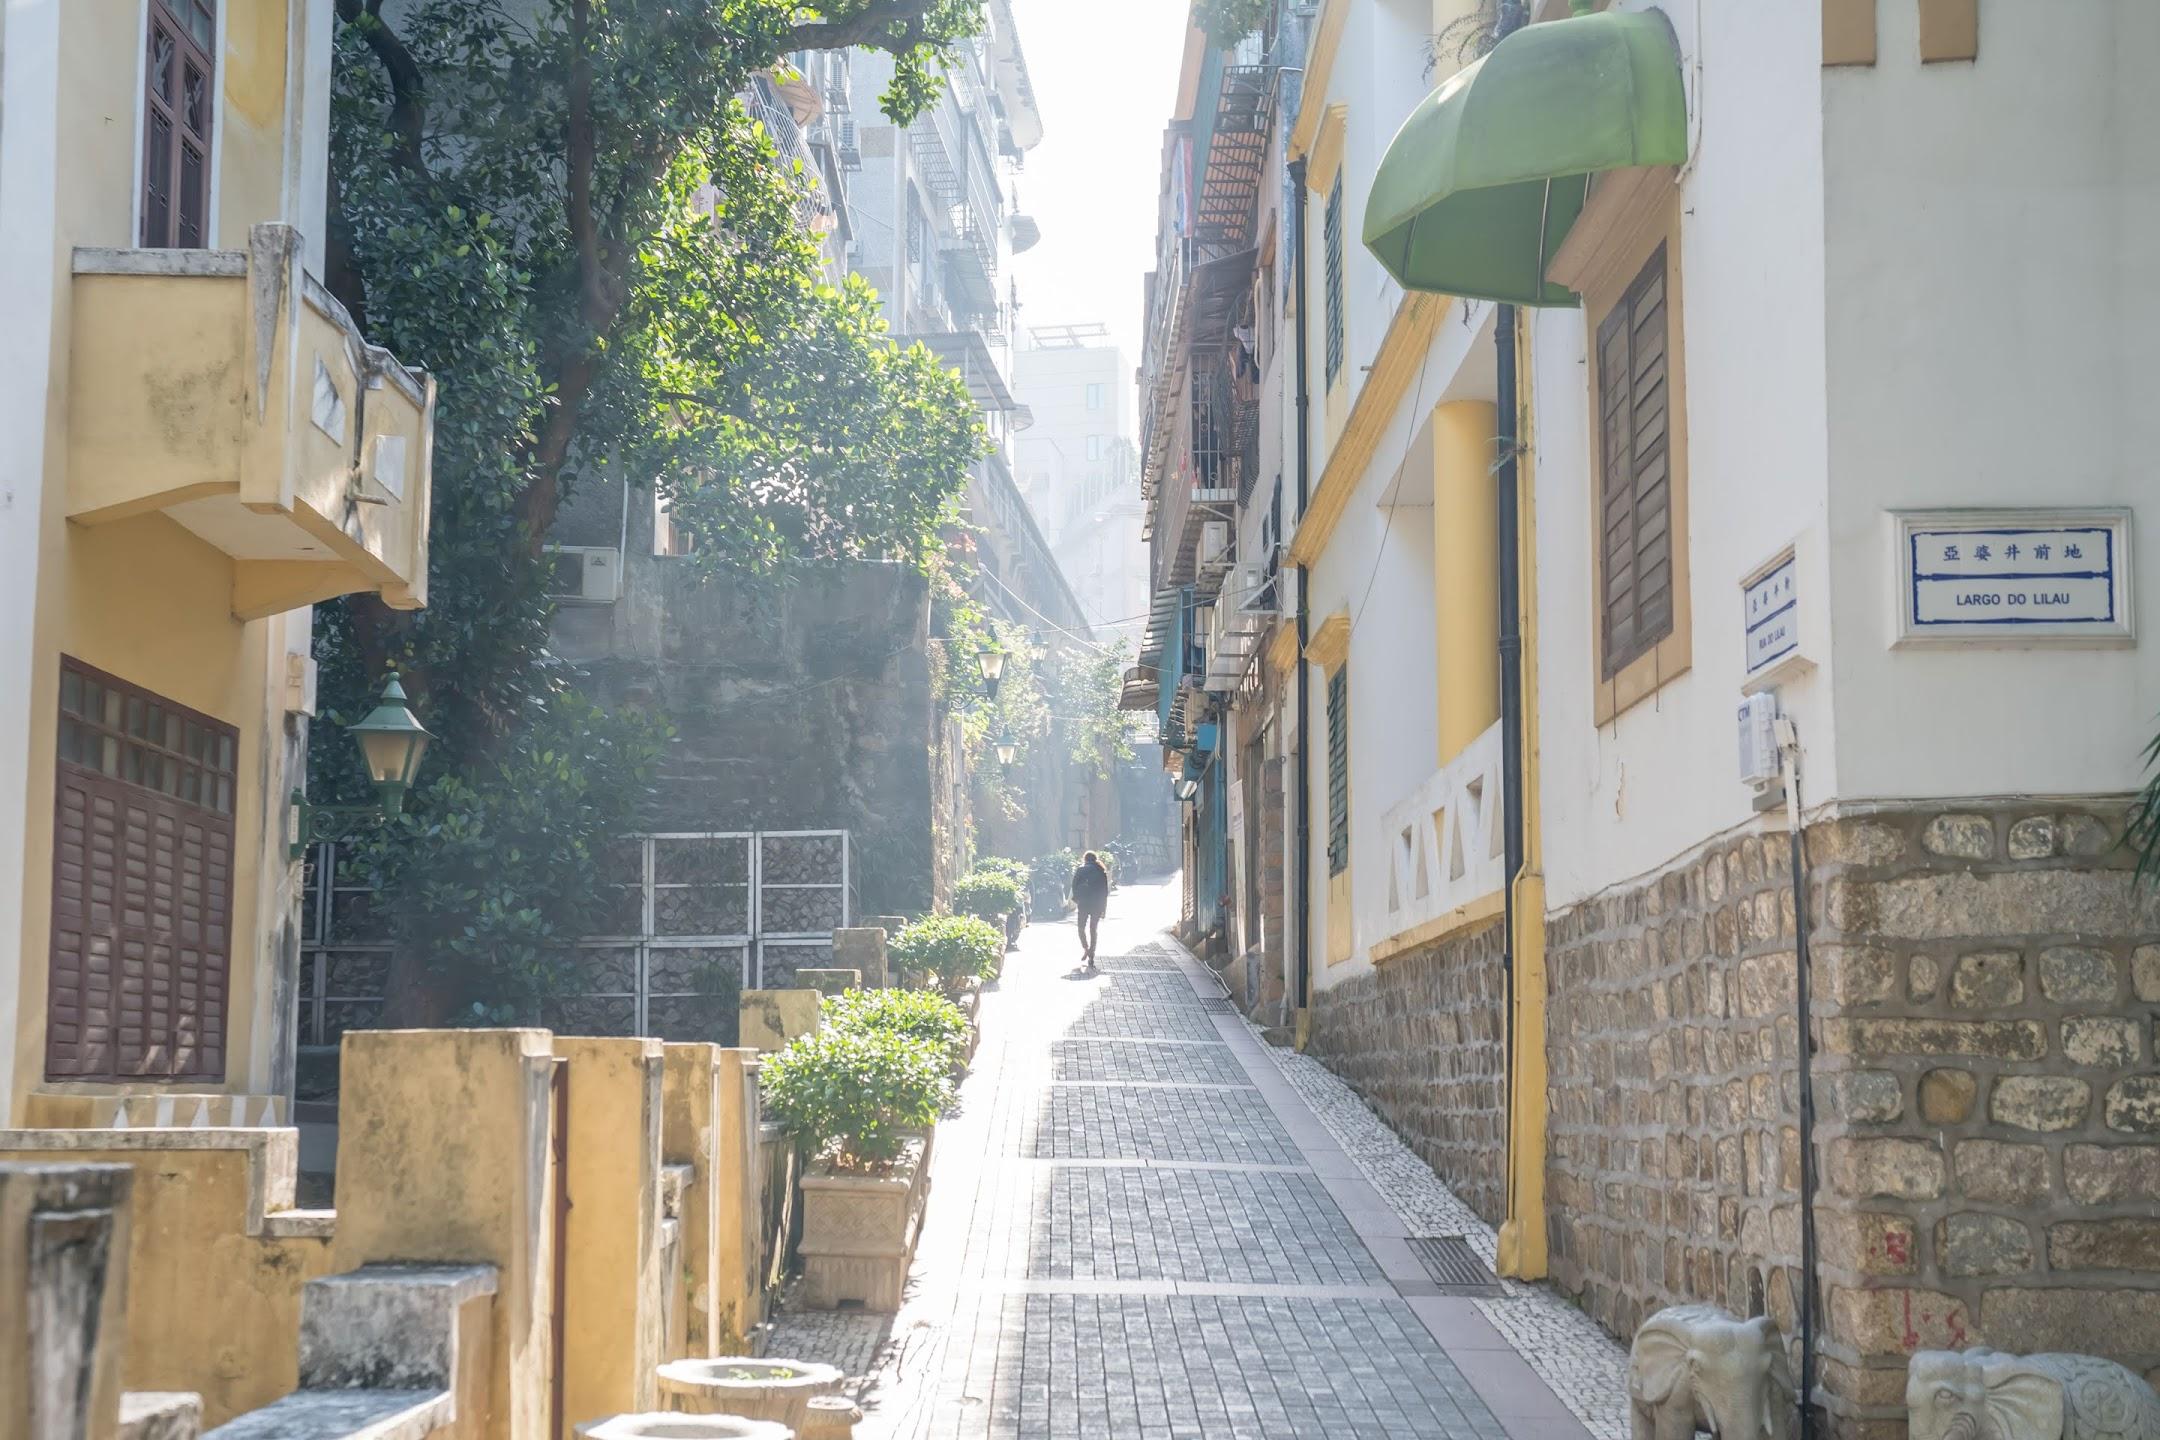 Macau off-street5